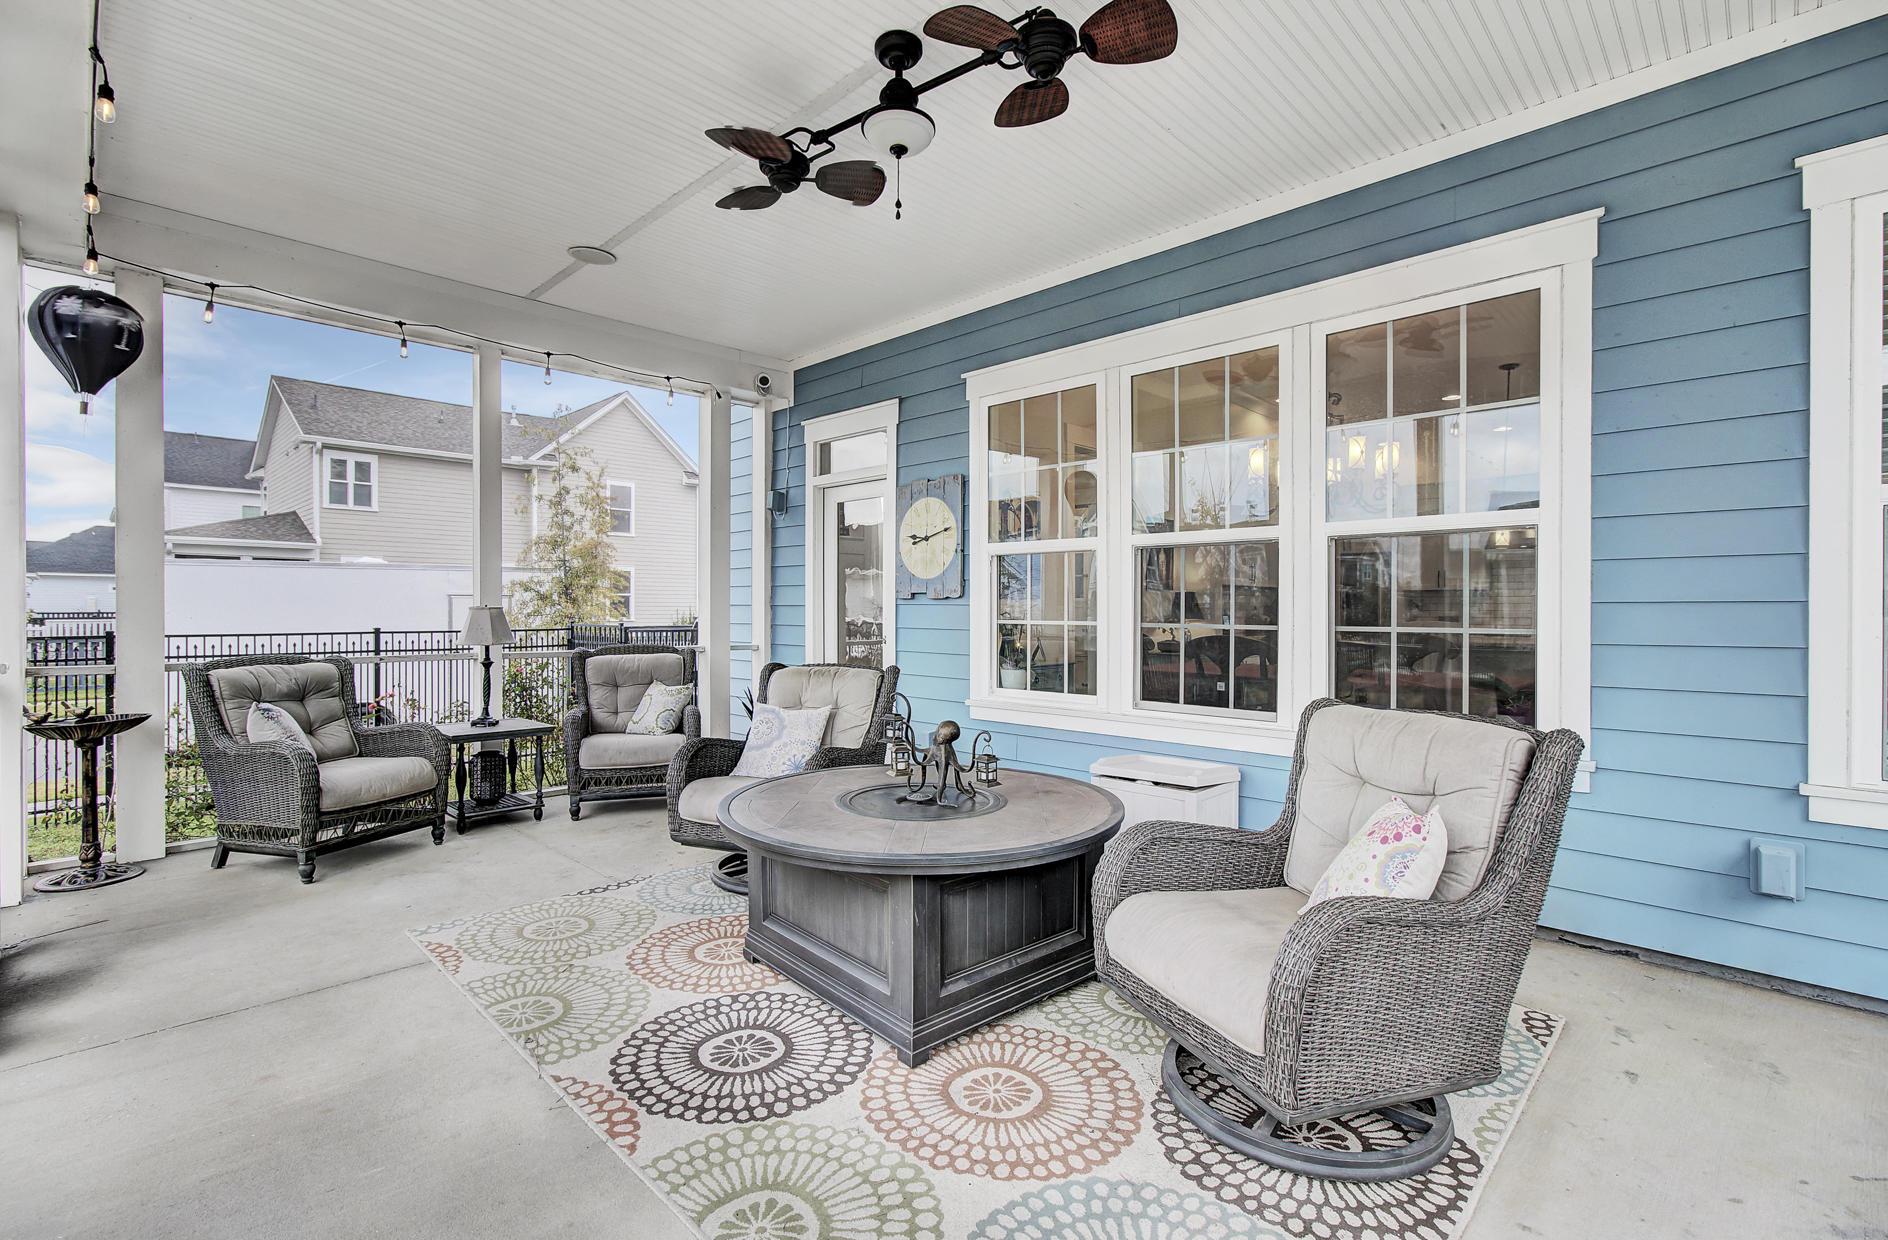 Carnes Crossroads Homes For Sale - 146 Callibluff, Summerville, SC - 39